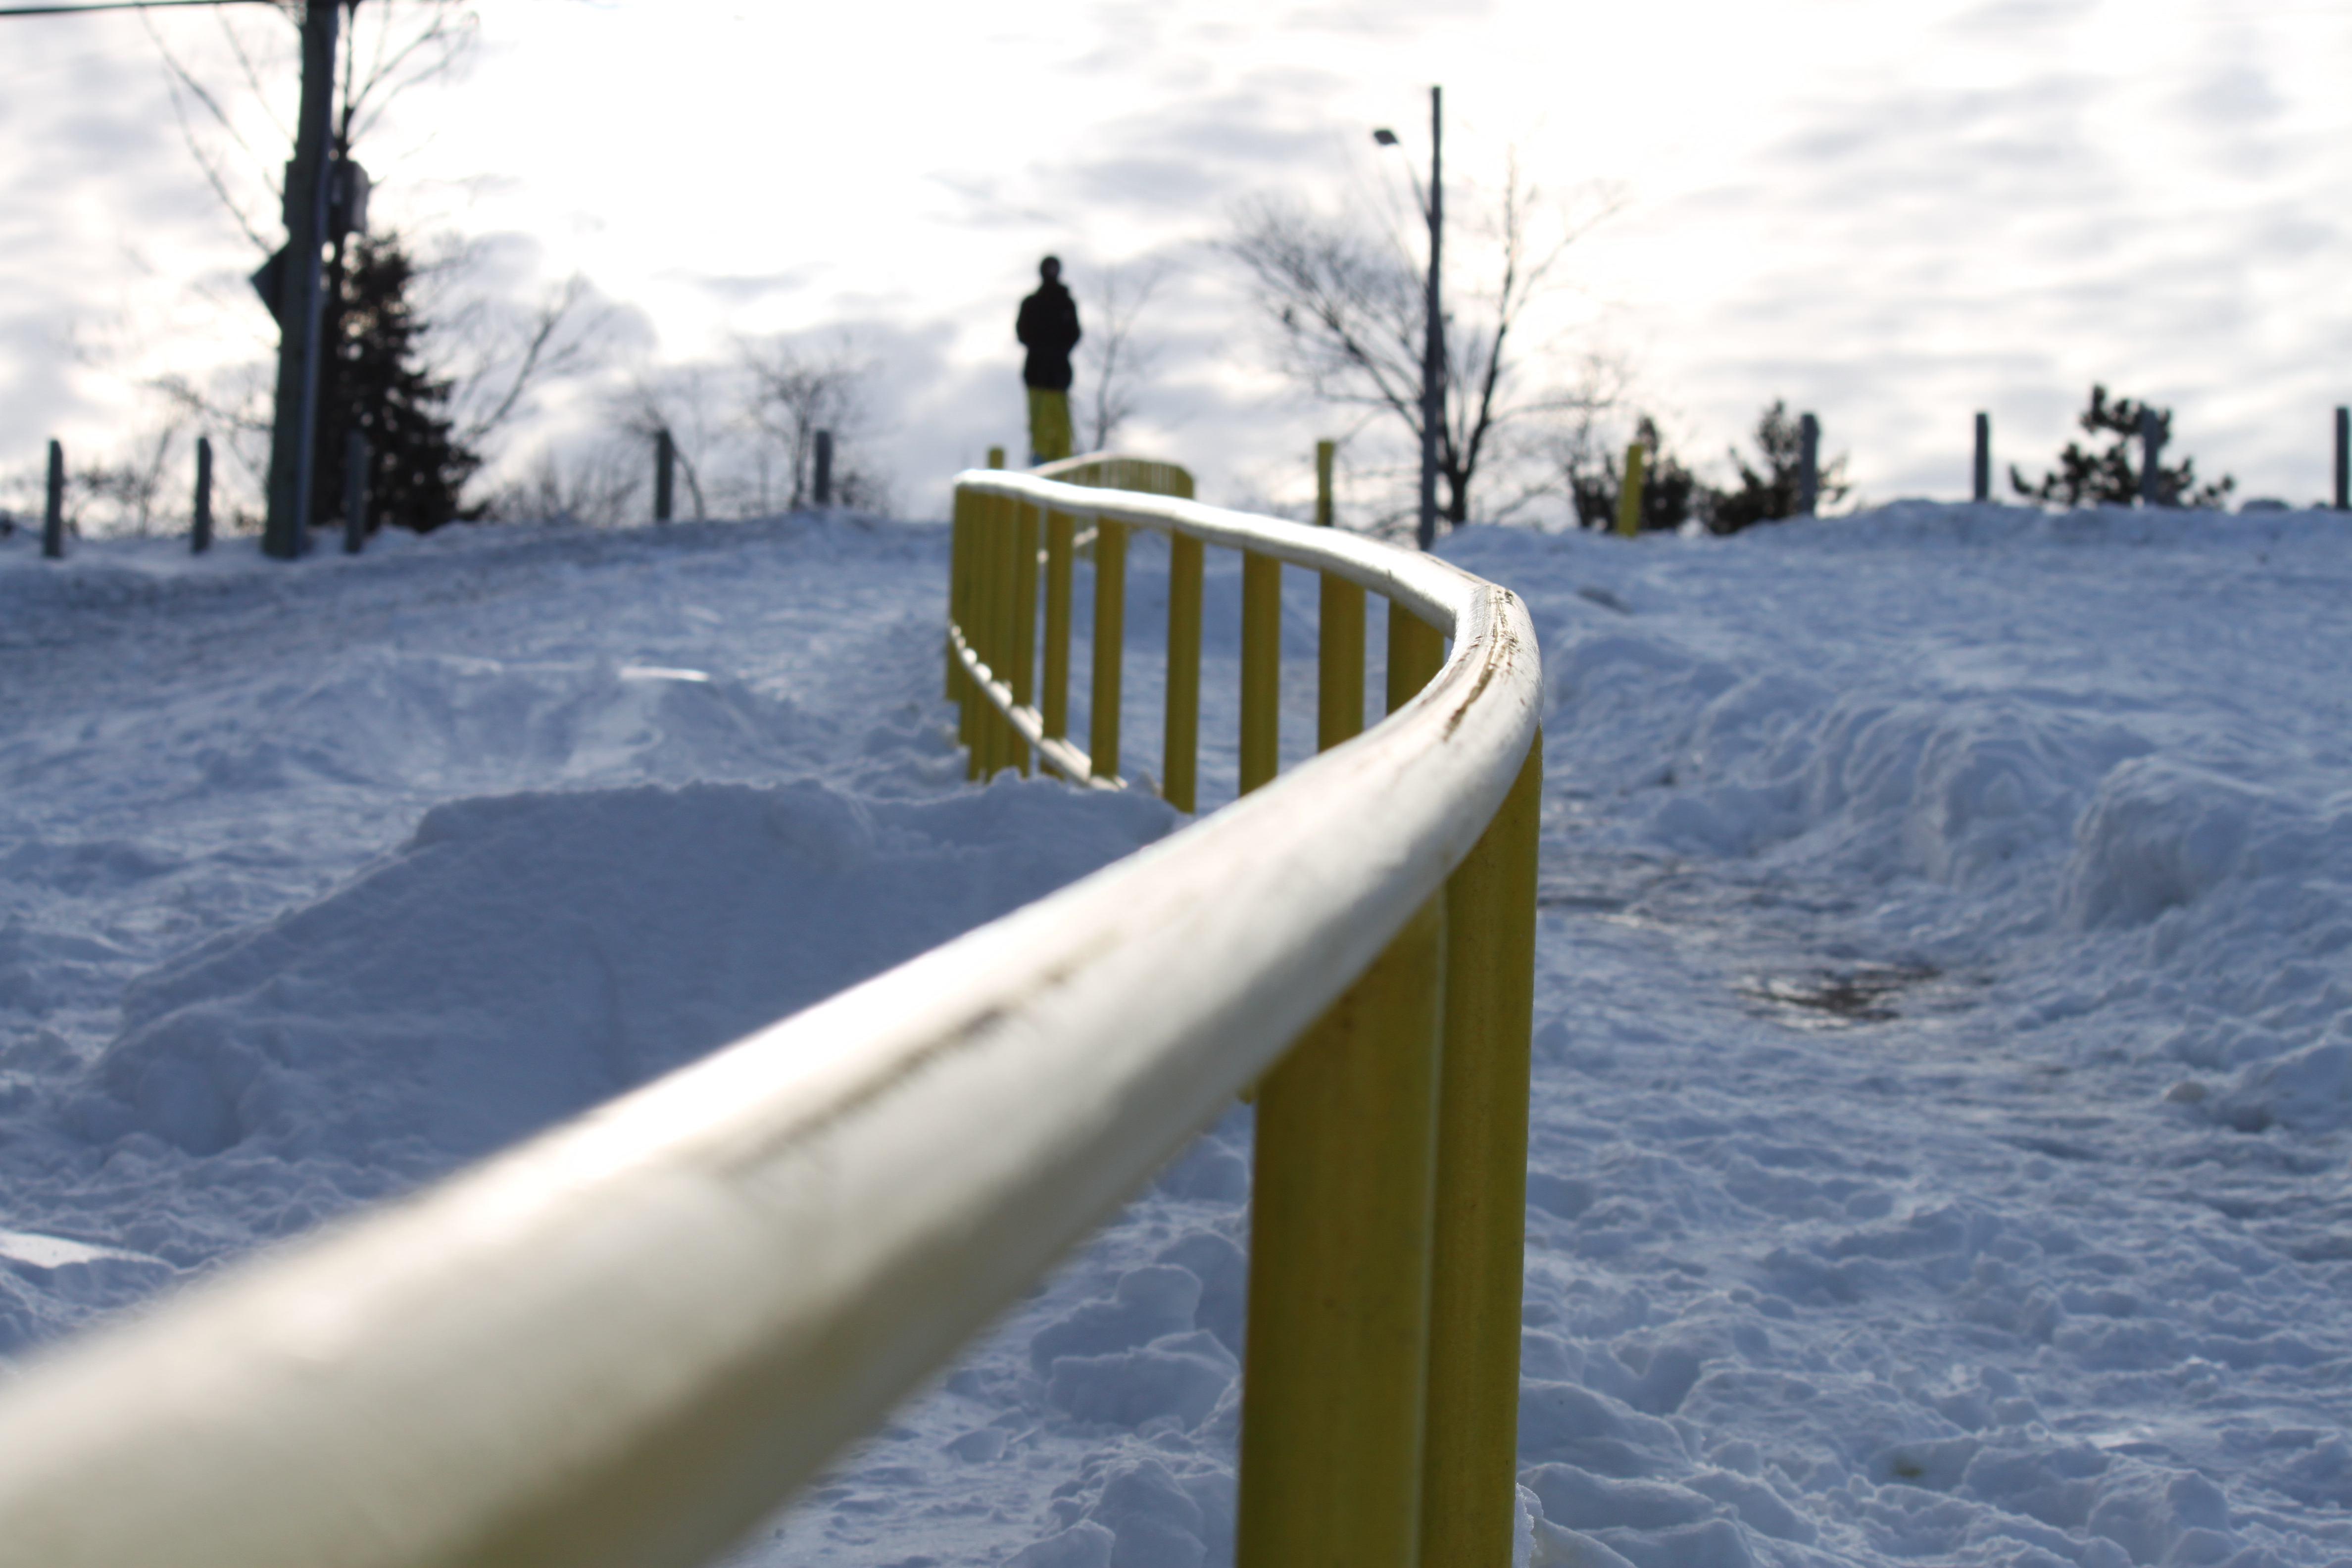 Sick hand rail